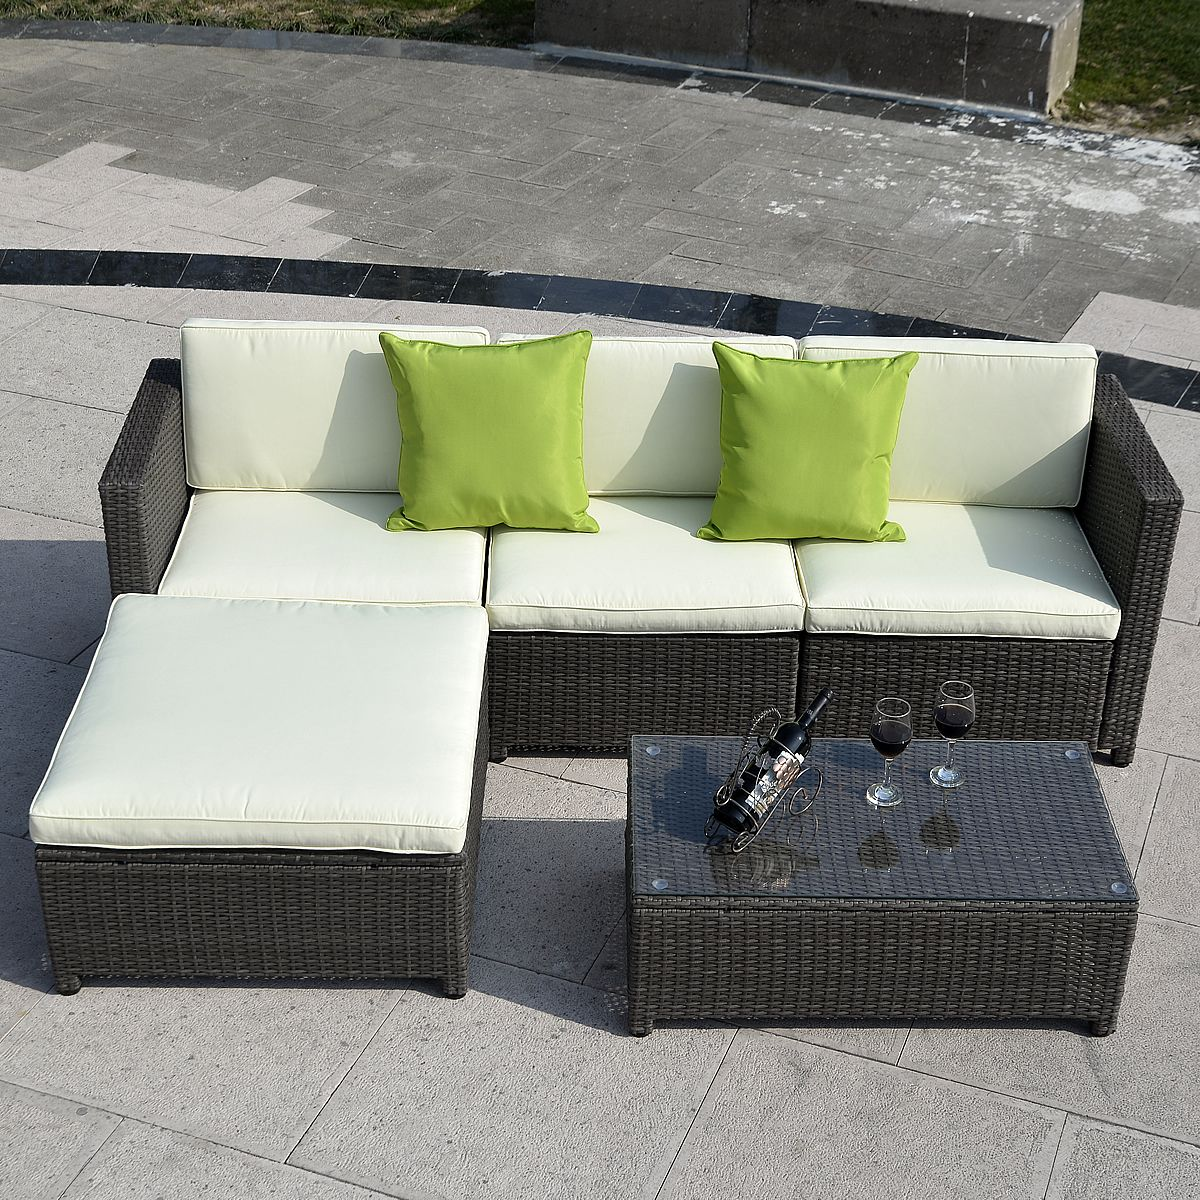 Prime 5 Pcs Wicker Rattan Sofa Cushioned Set Furniture Outdoor Ibusinesslaw Wood Chair Design Ideas Ibusinesslaworg